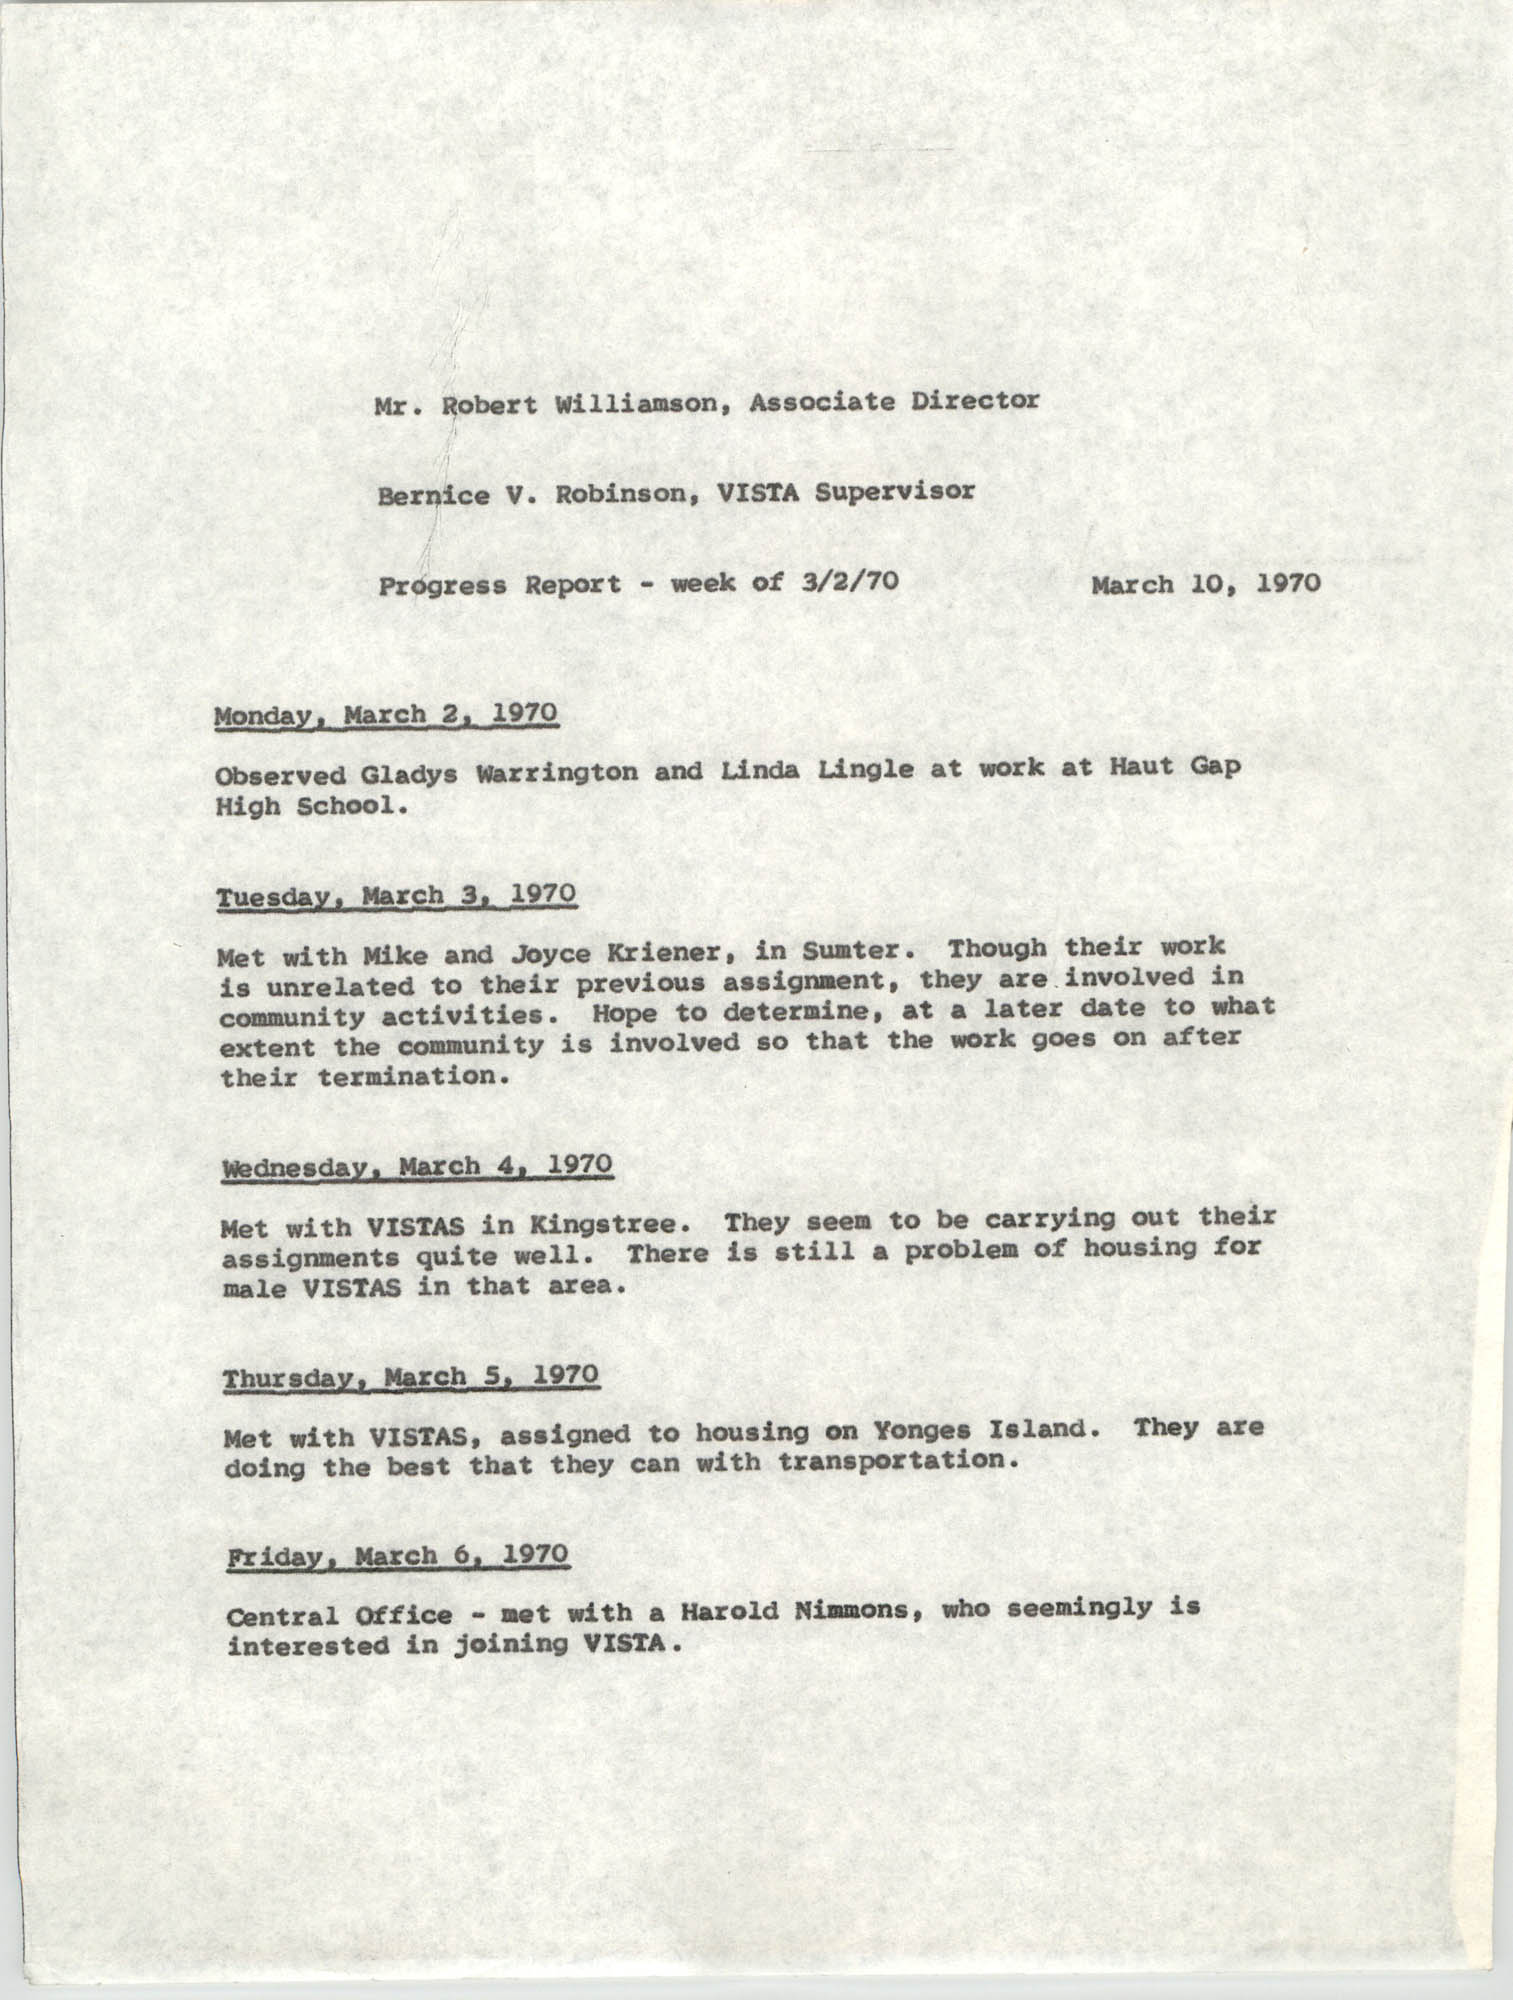 VISTA Progress Report, Week of March 2, 1970